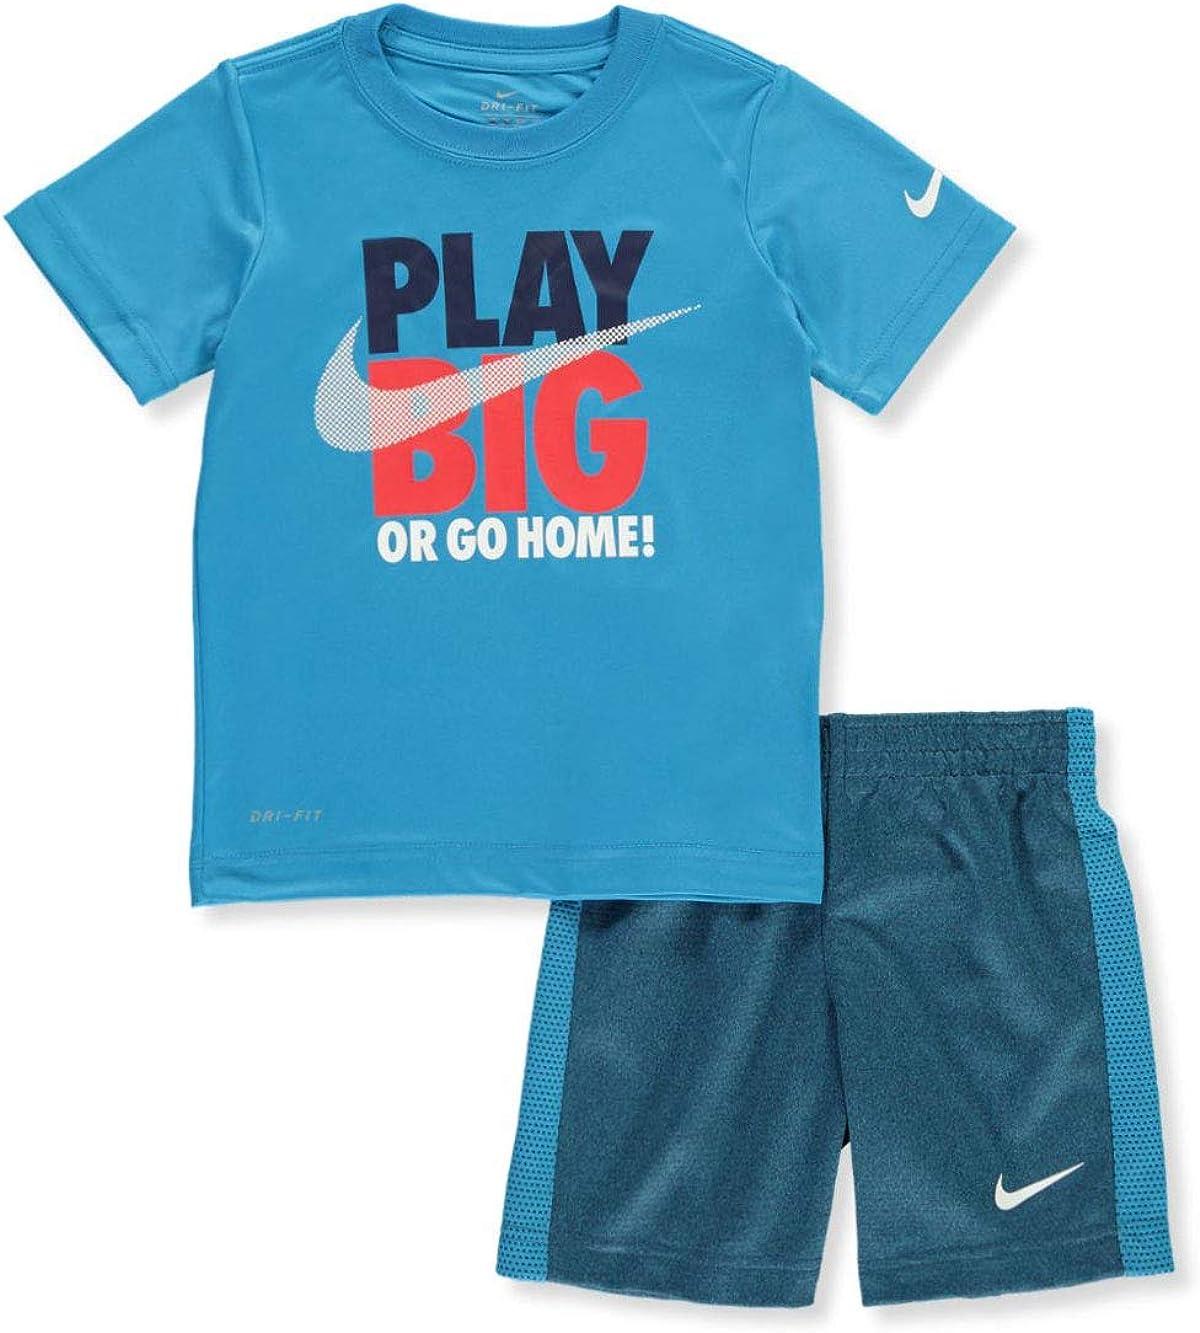 Nike Boys' Play Big 2-Piece Shorts Set Outfit - Multi, 5